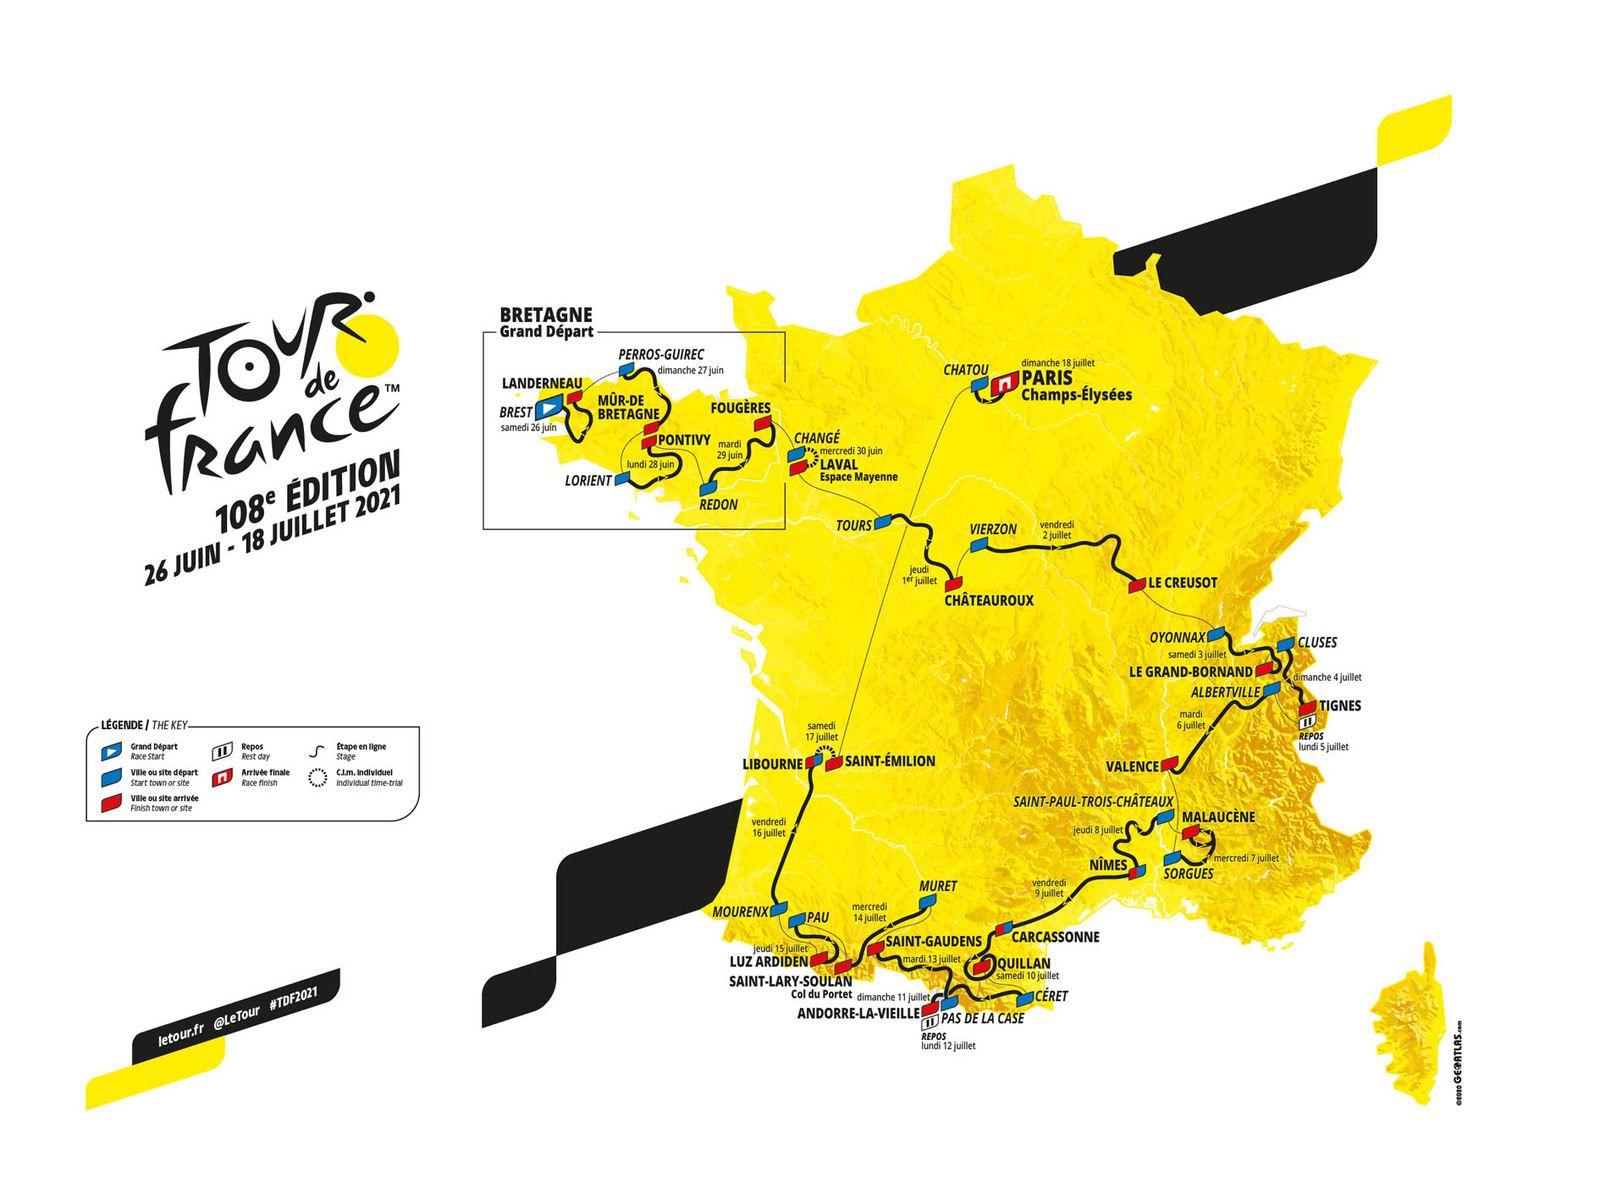 Gloire au Tour de France, gloire au Tour de France....